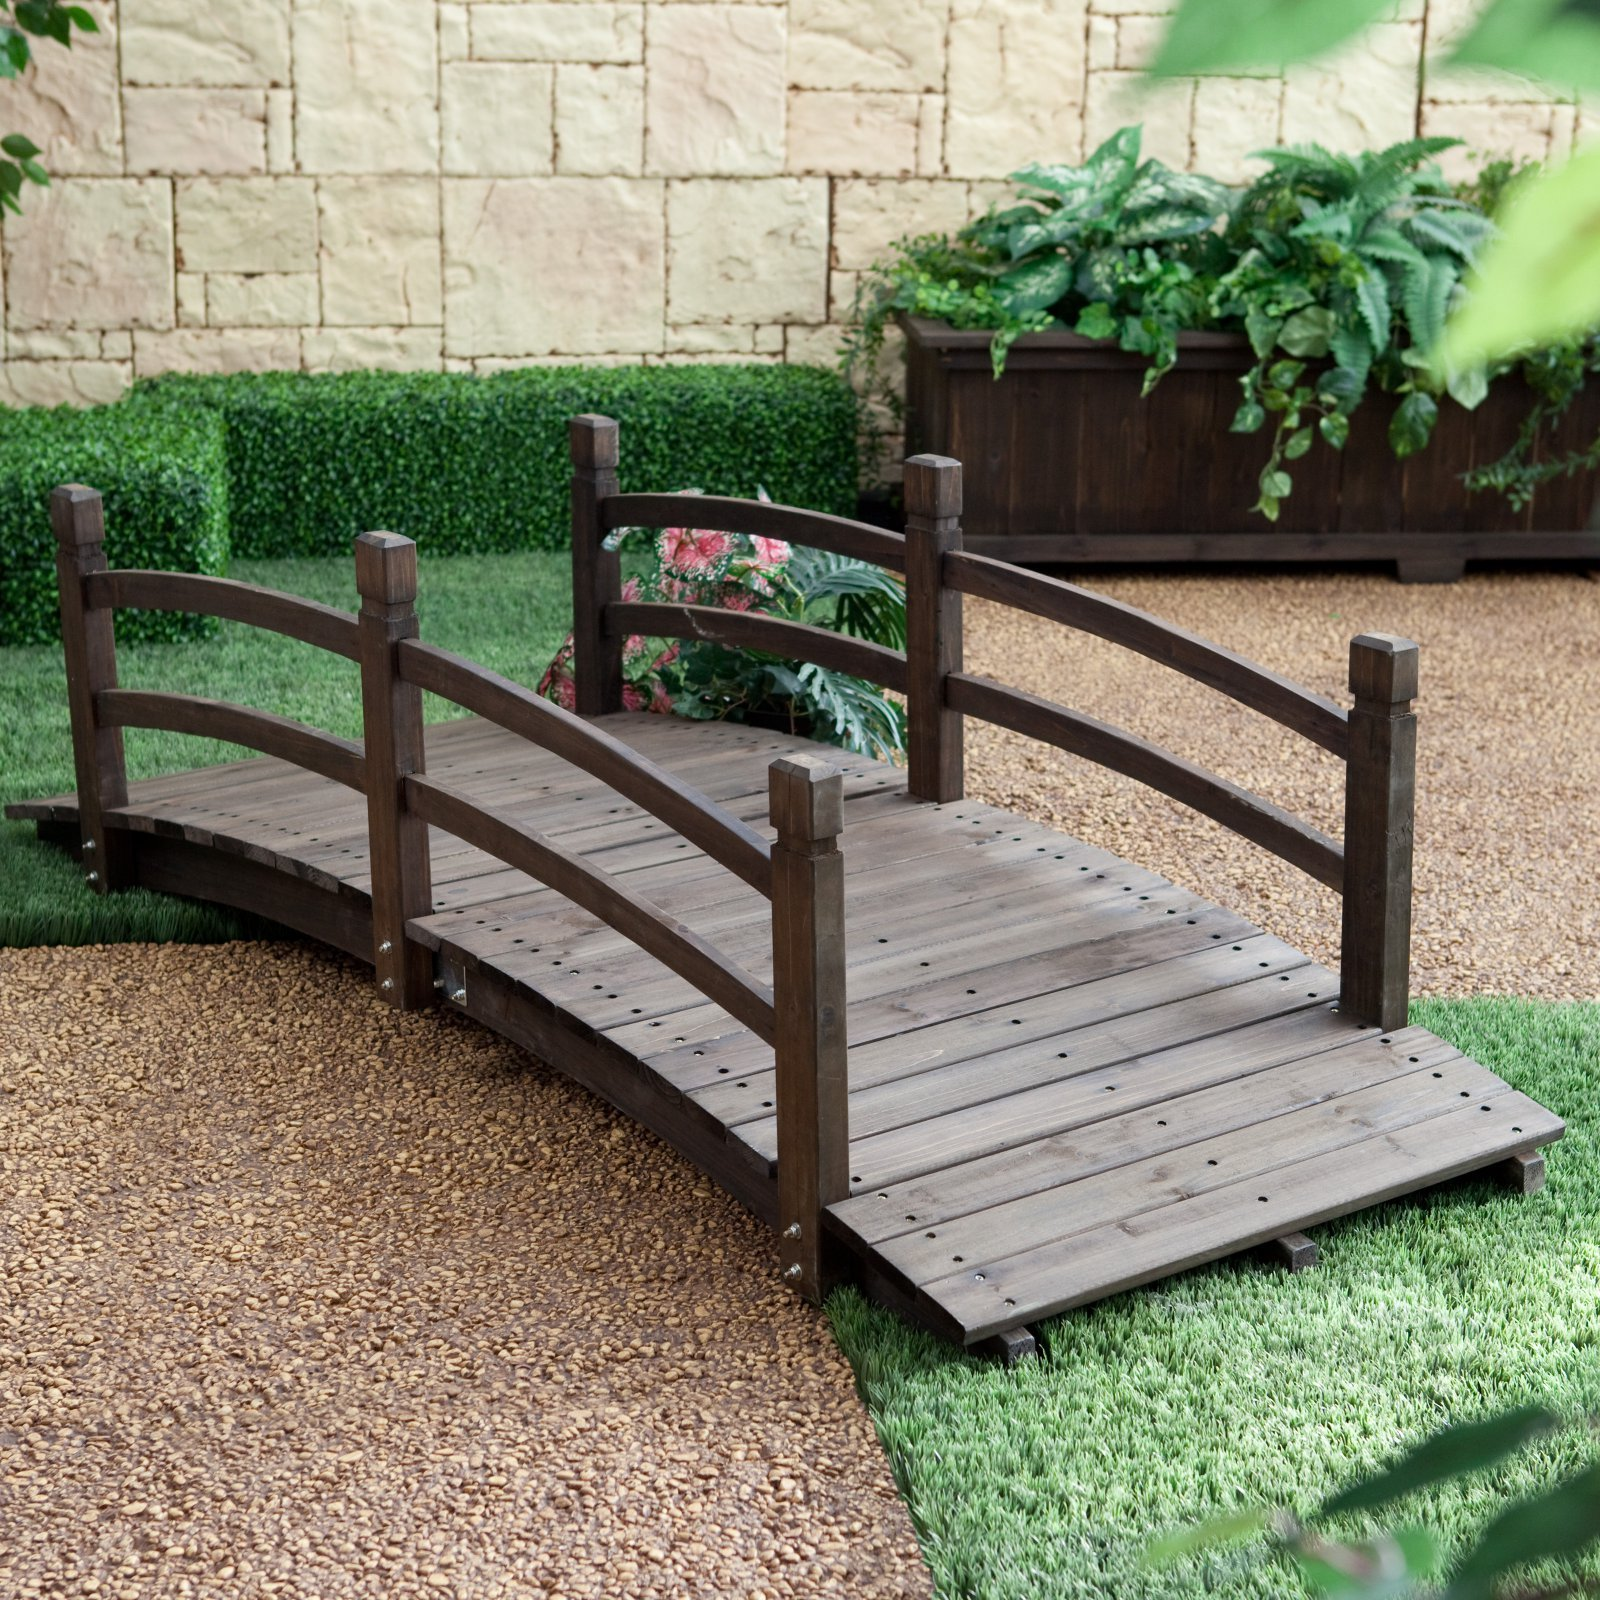 Espresso Brown Finish Wood 72'' Garden Bridge Outdoor Yard Lawn Landscaping Decor